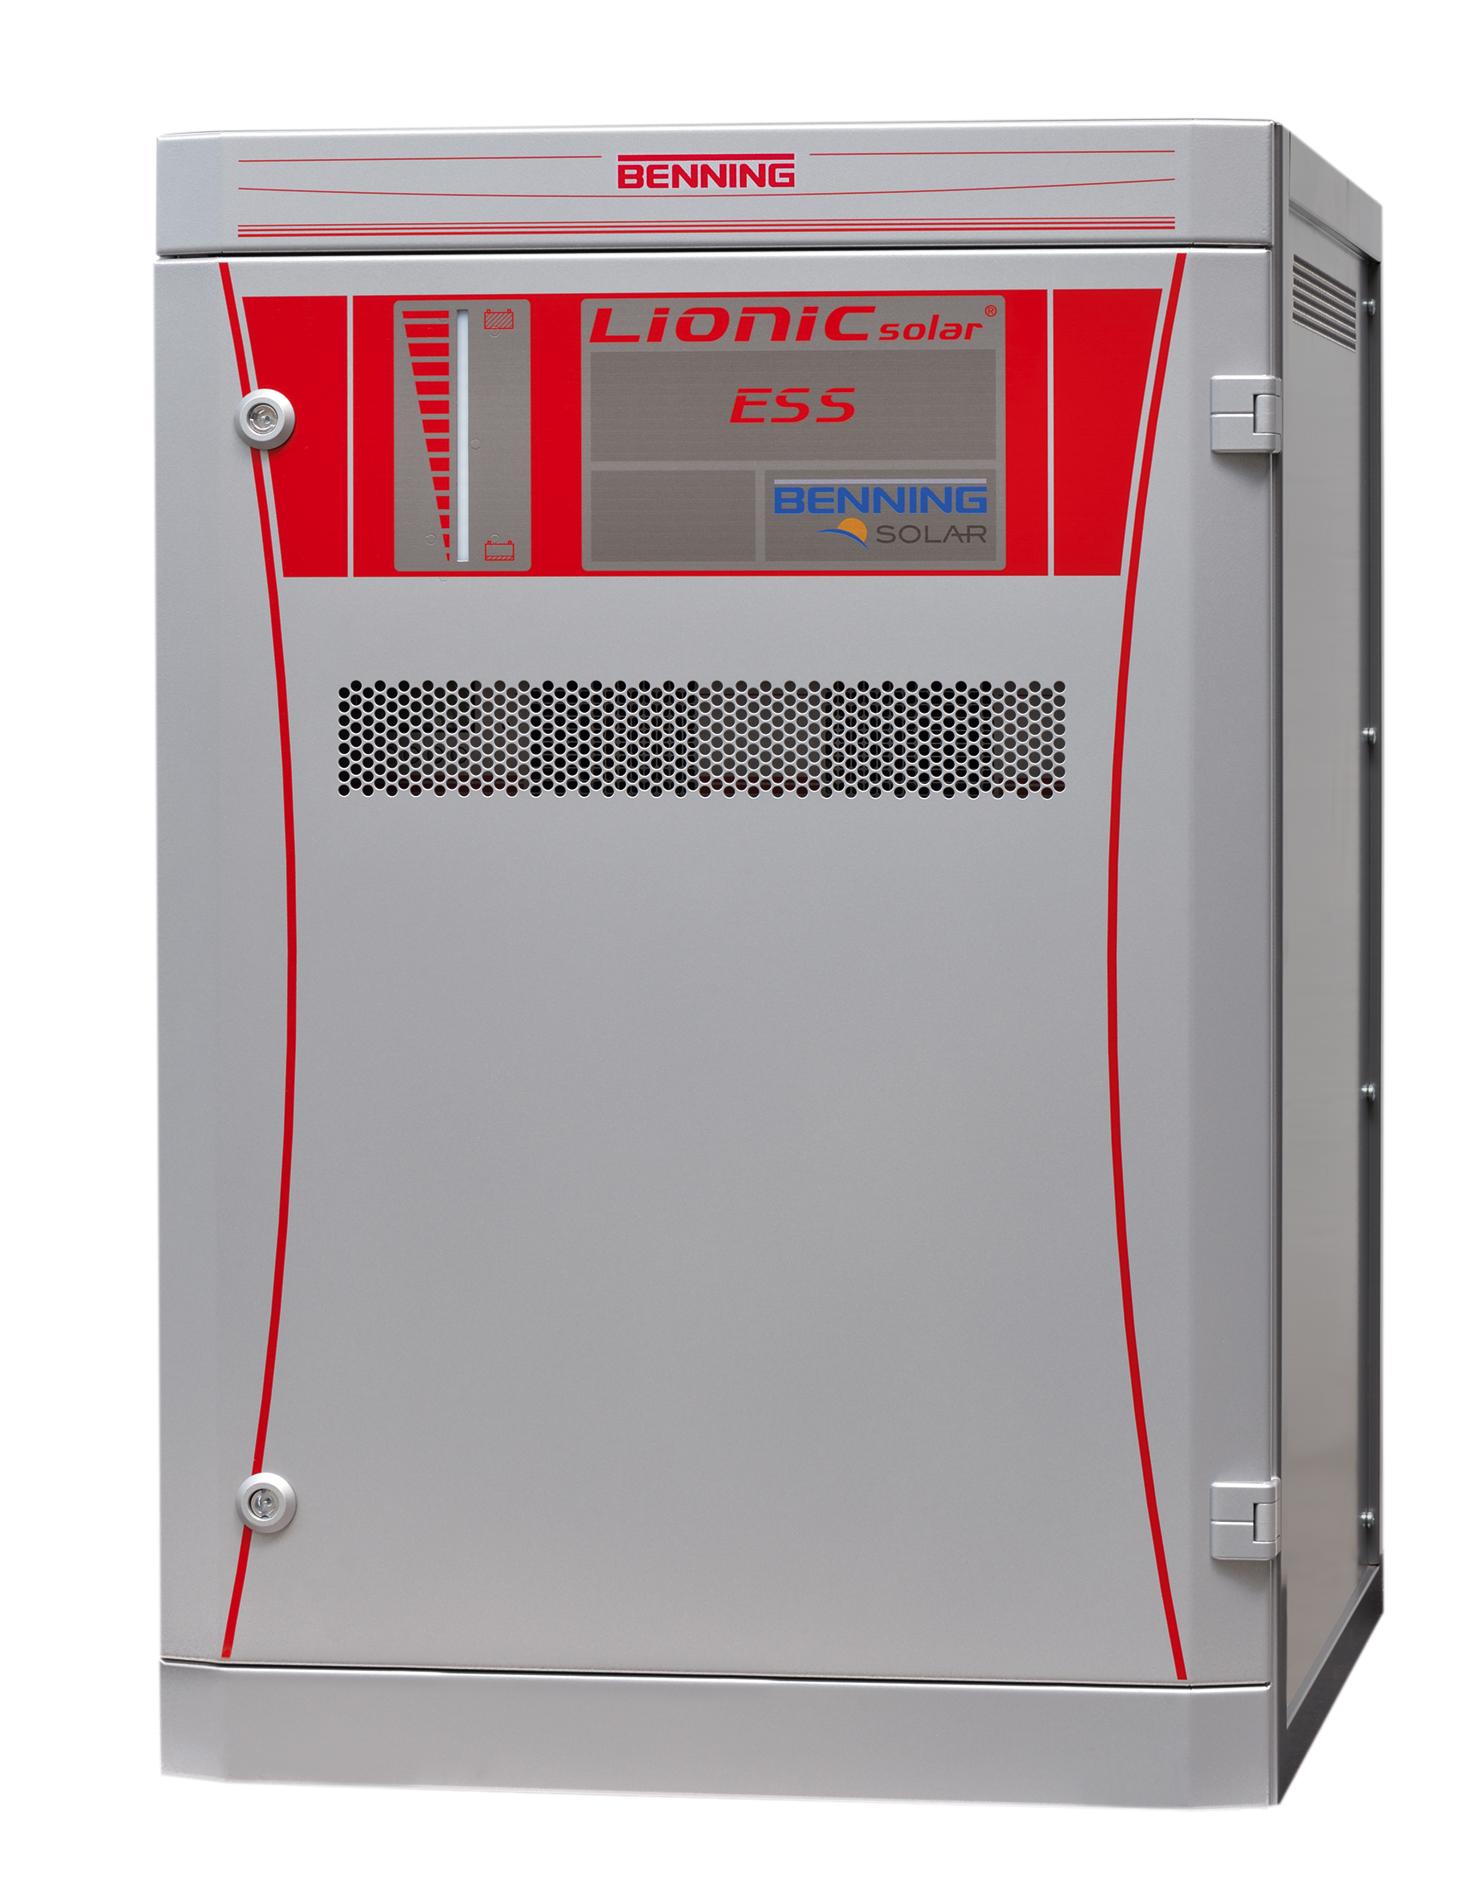 1 Stk LIONICsolar ESS Komplettsystem, 4,3 kW WR, 4 kWH Batterie PVES0001--